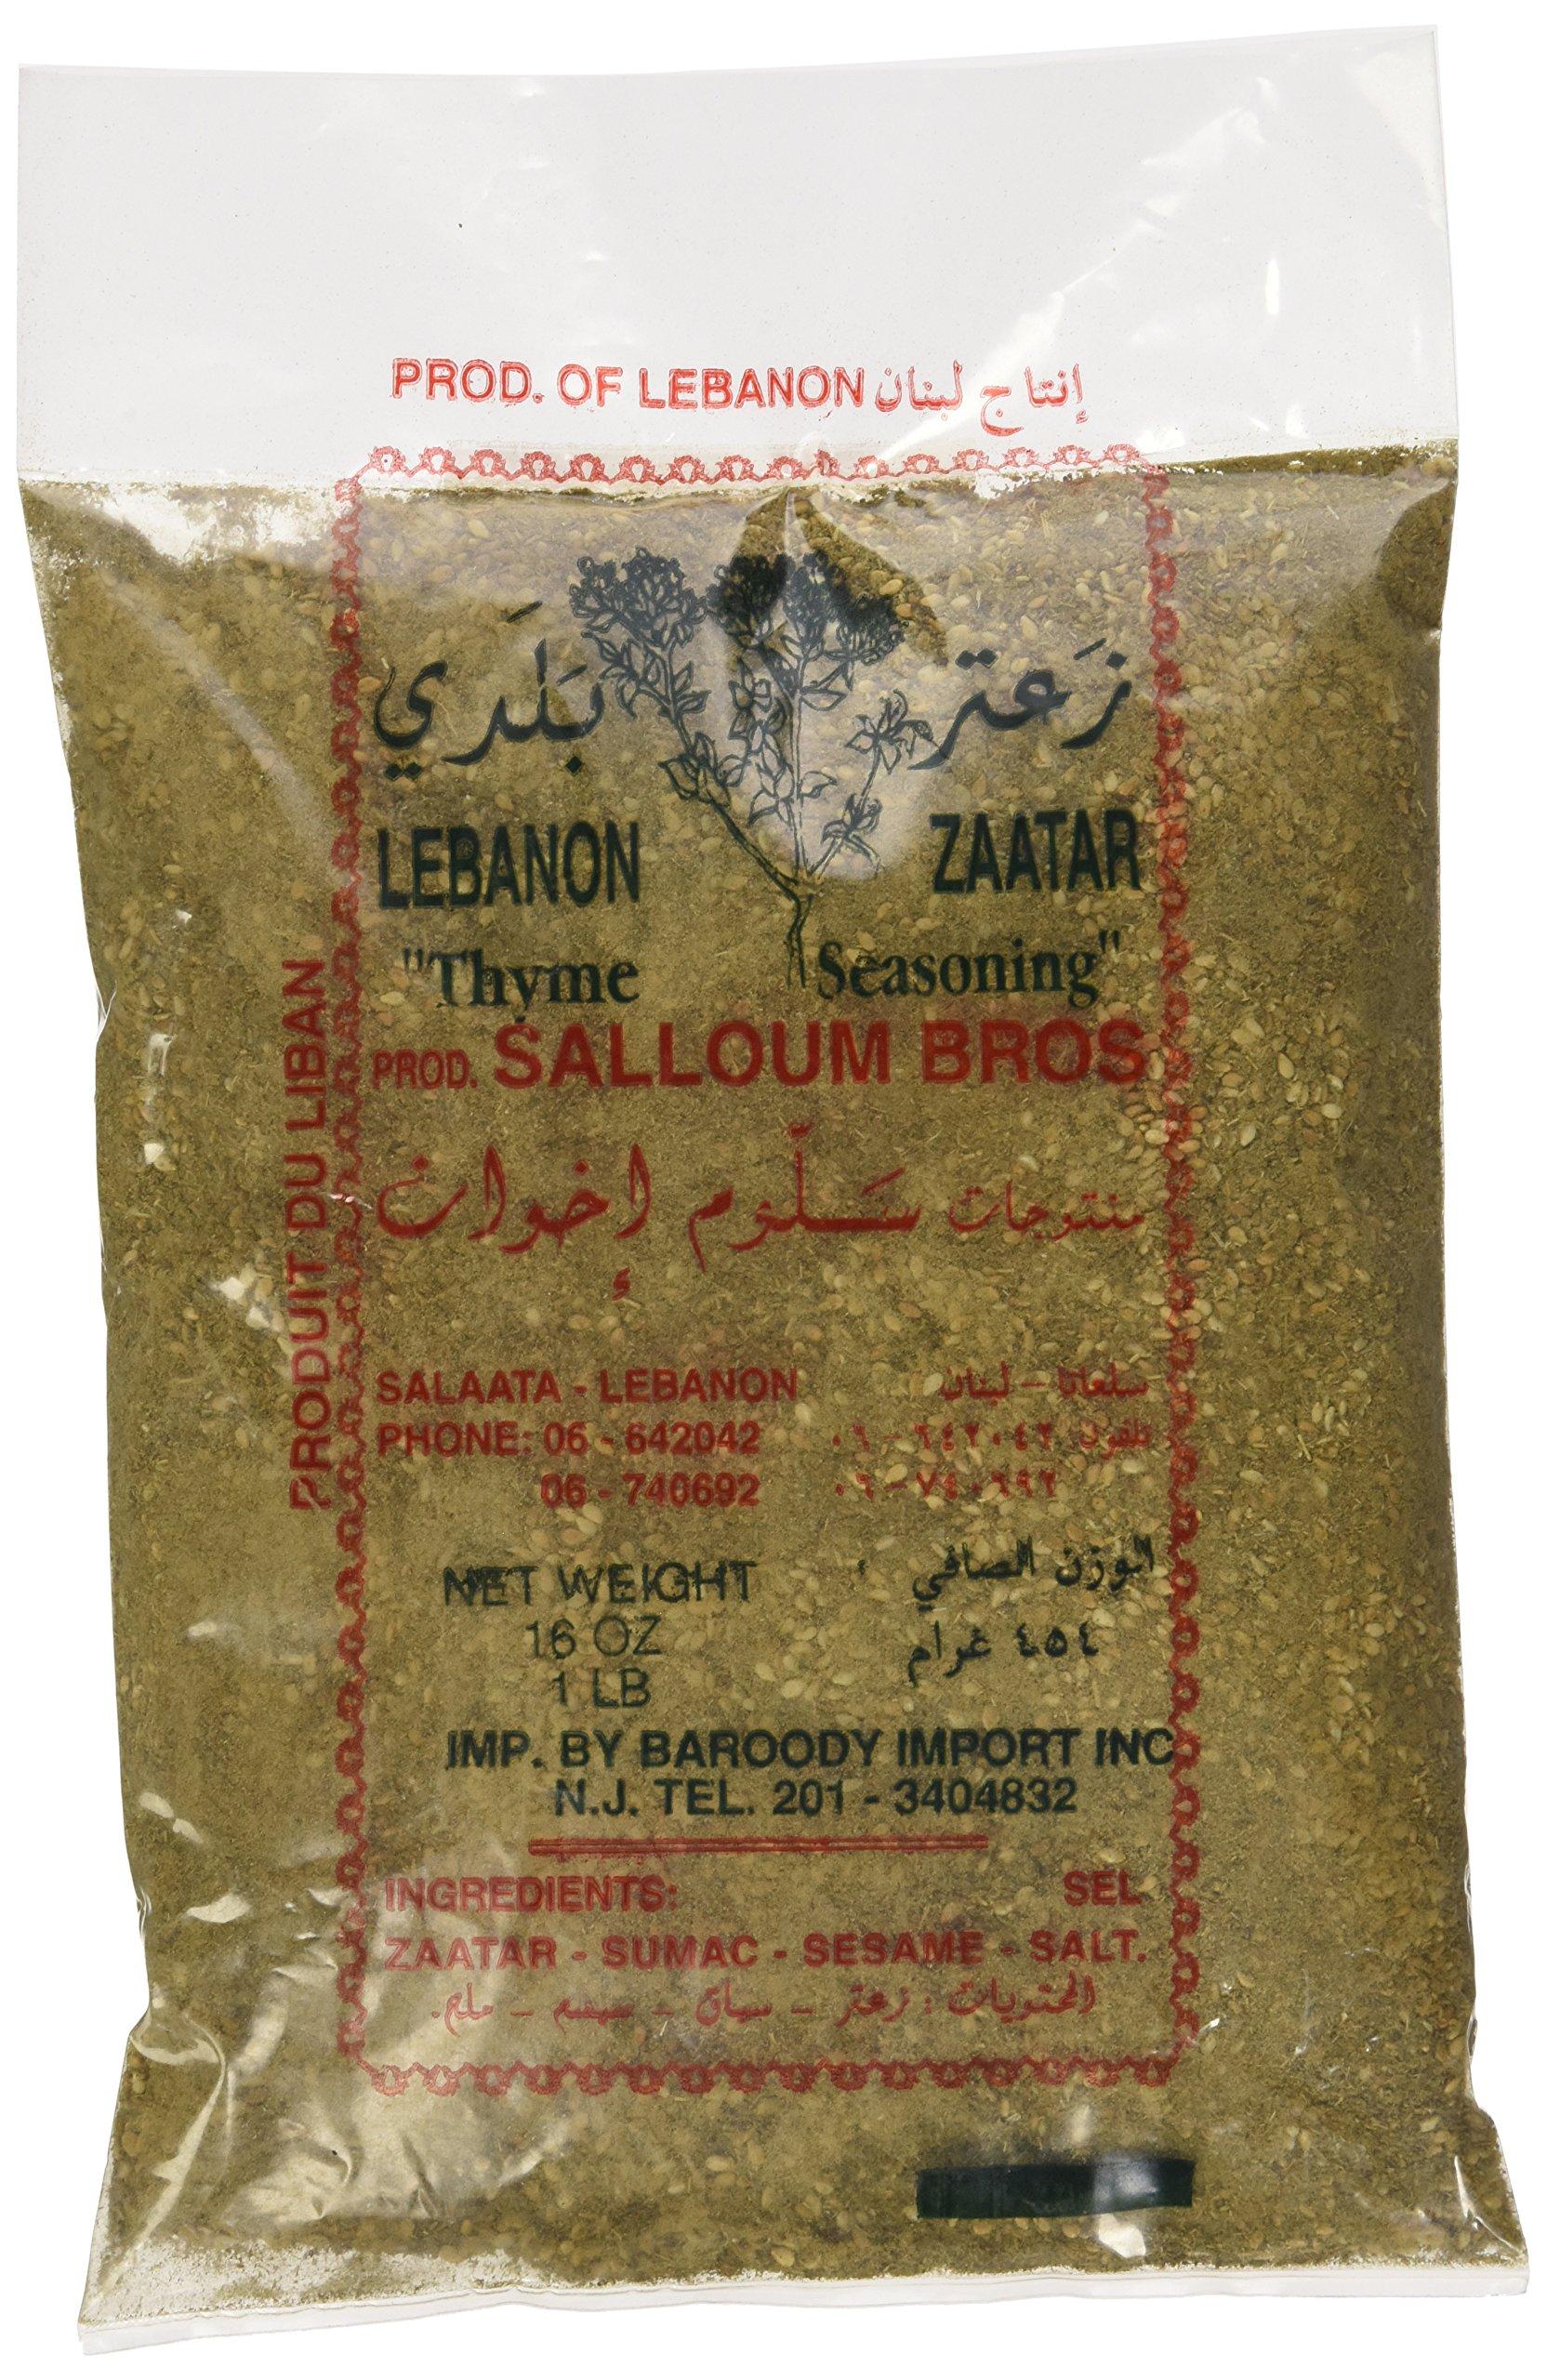 Lebanon Za'atar 1 Lb Thyme Seasoning 16 oz 1LB